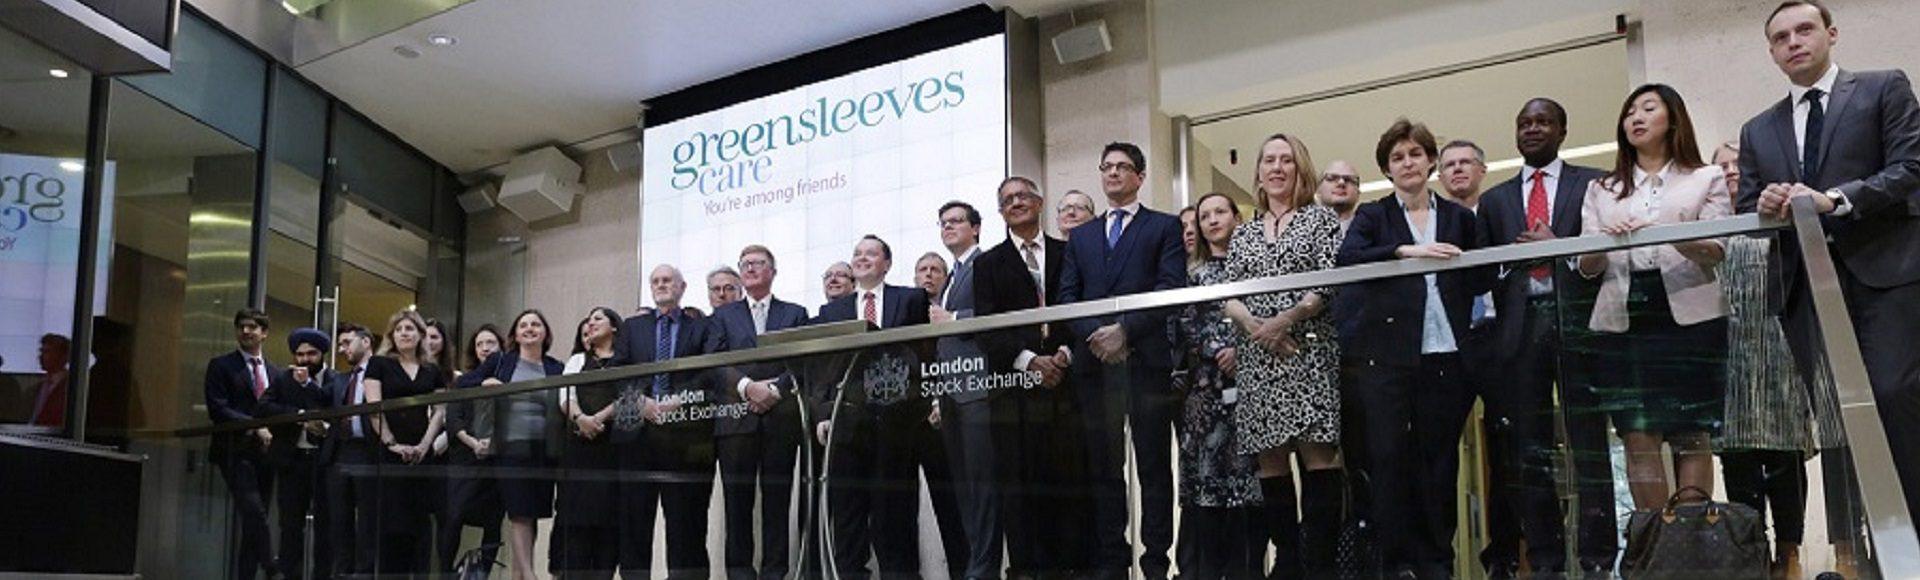 Greensleeves Charity Bond